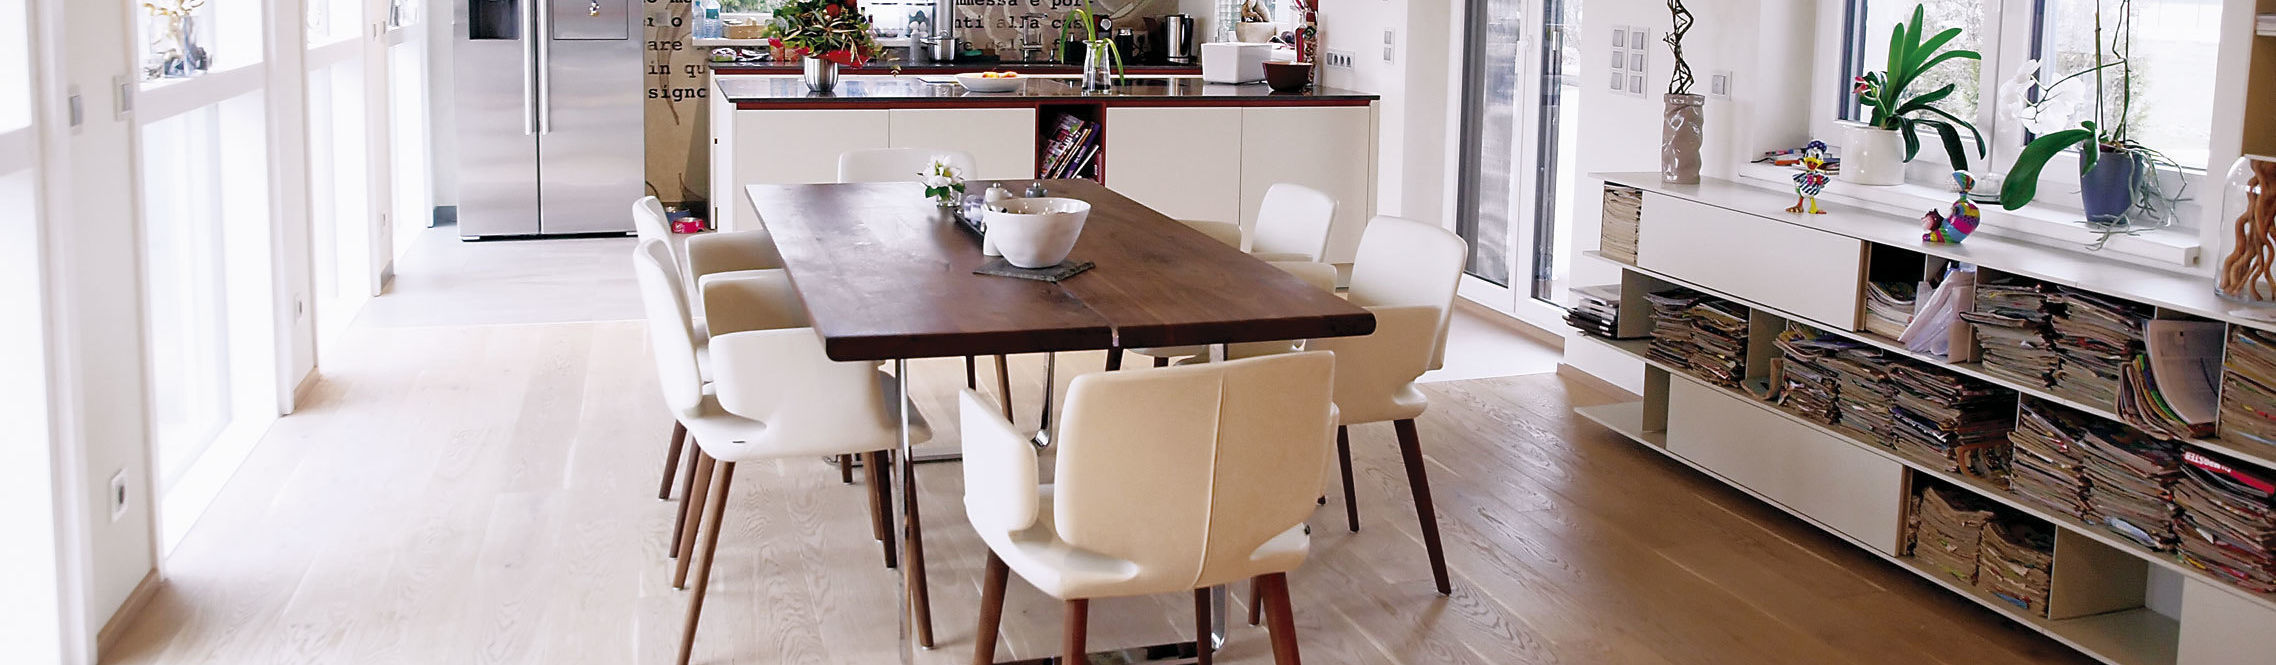 gartenmobel alt wien interessante ideen. Black Bedroom Furniture Sets. Home Design Ideas